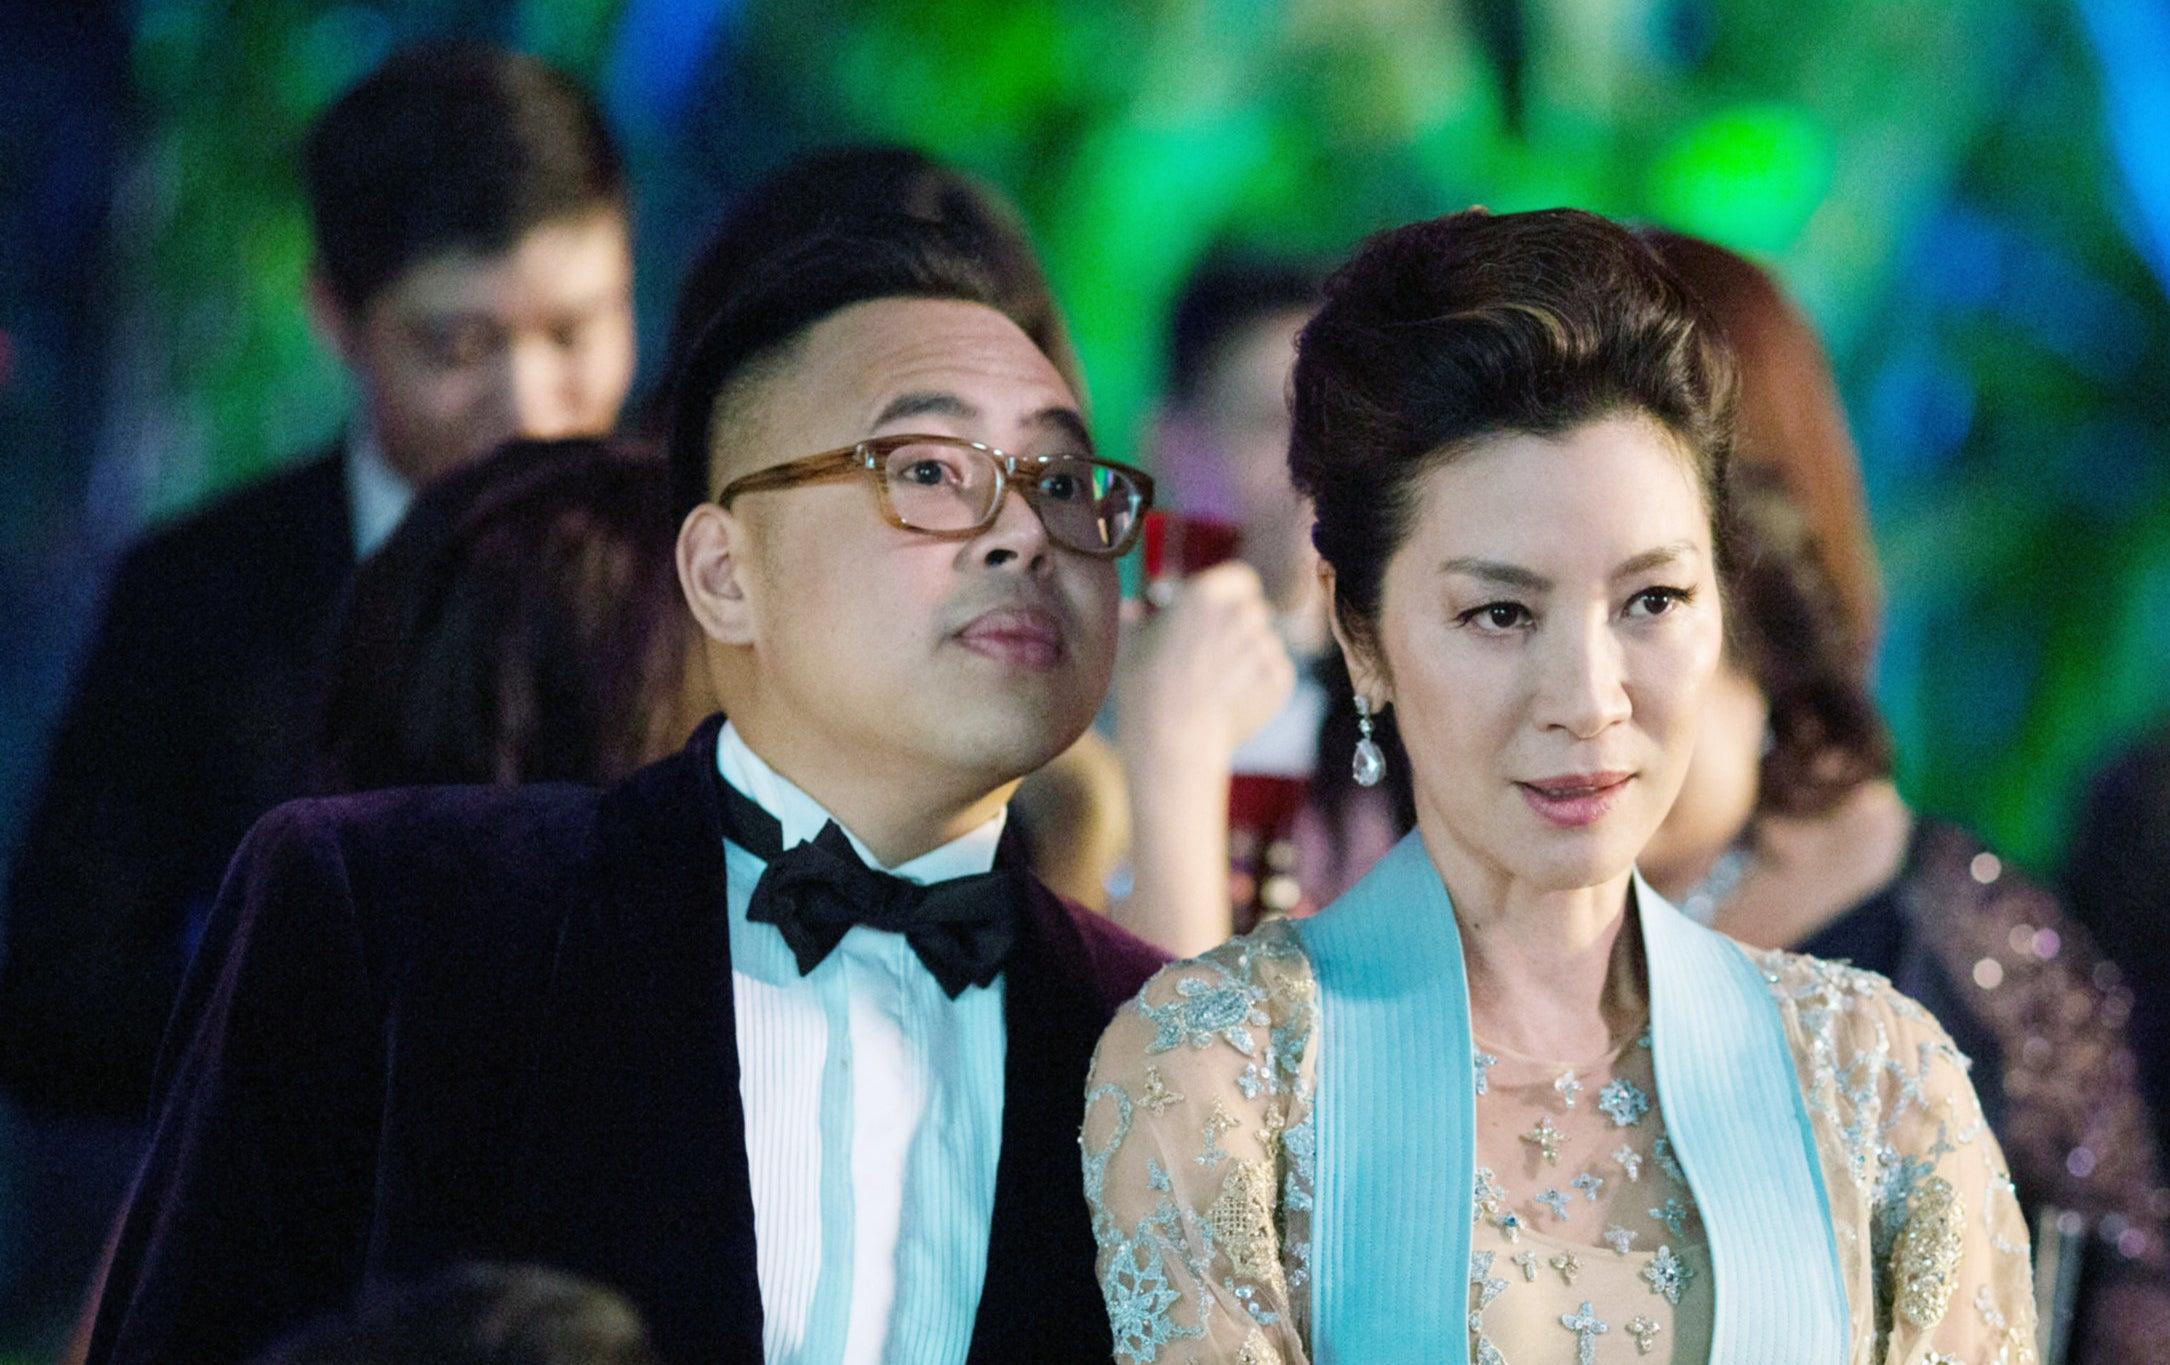 Nico Santos spies over Michelle Yeoh's shoulder